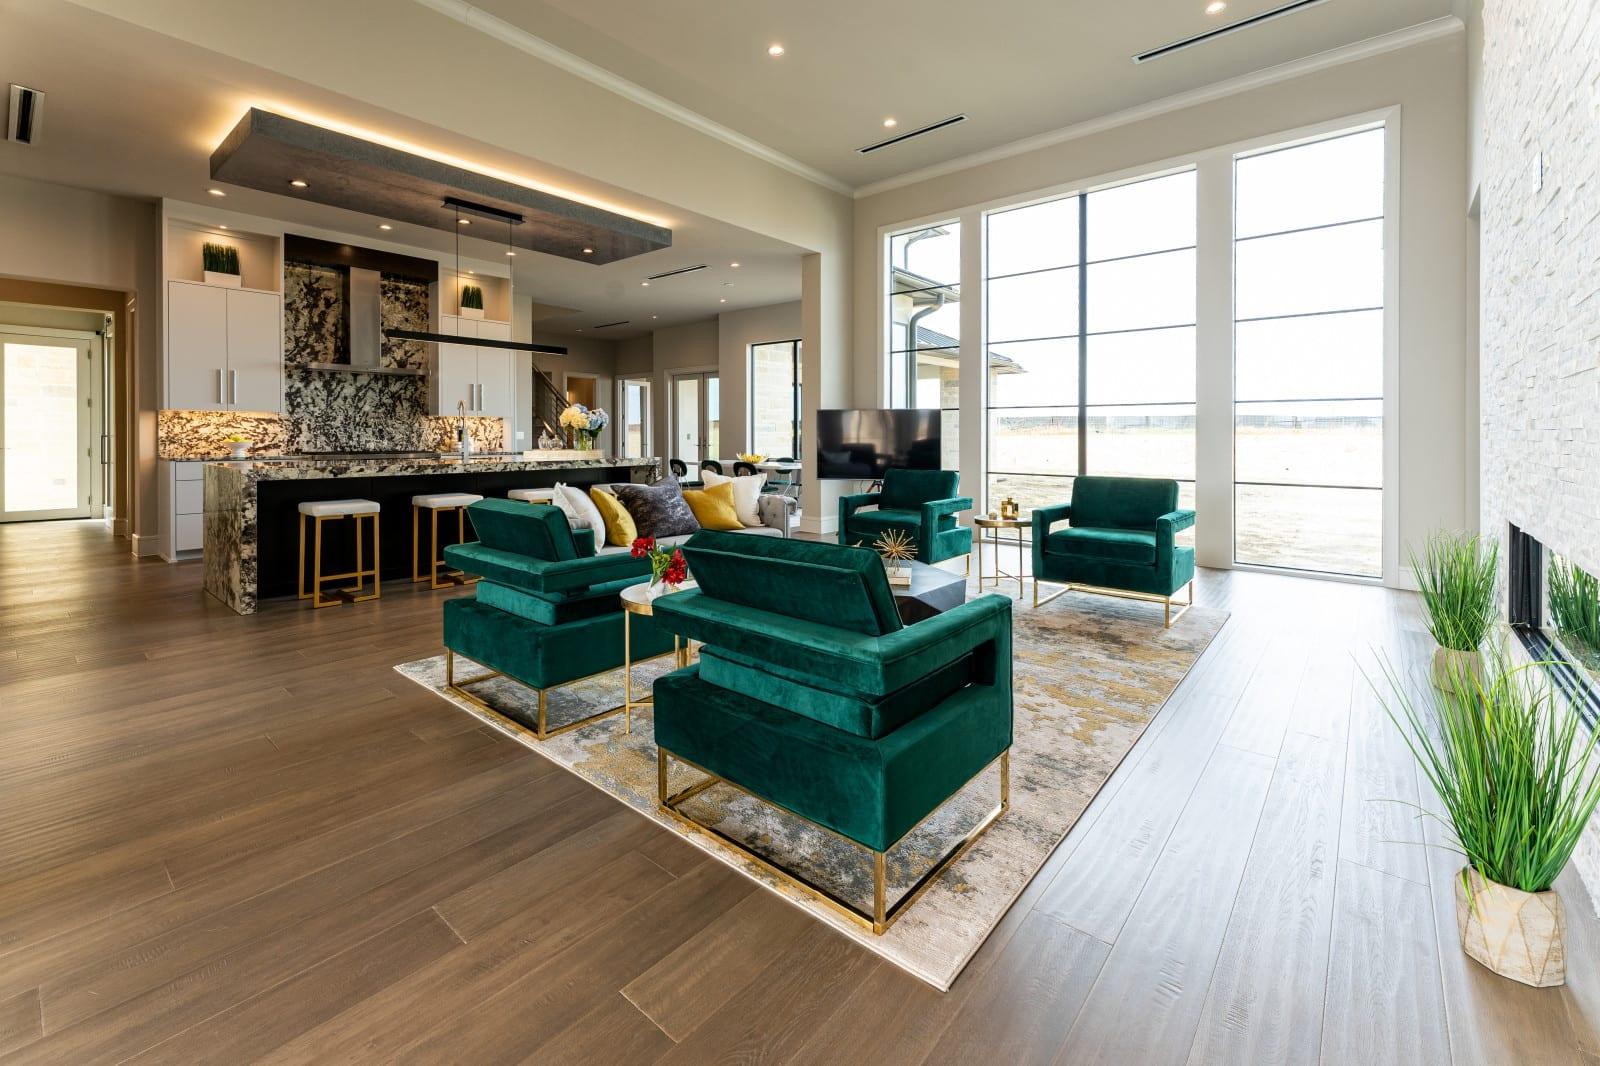 Modern Style Homes design # 11 - Millennial Design + Build